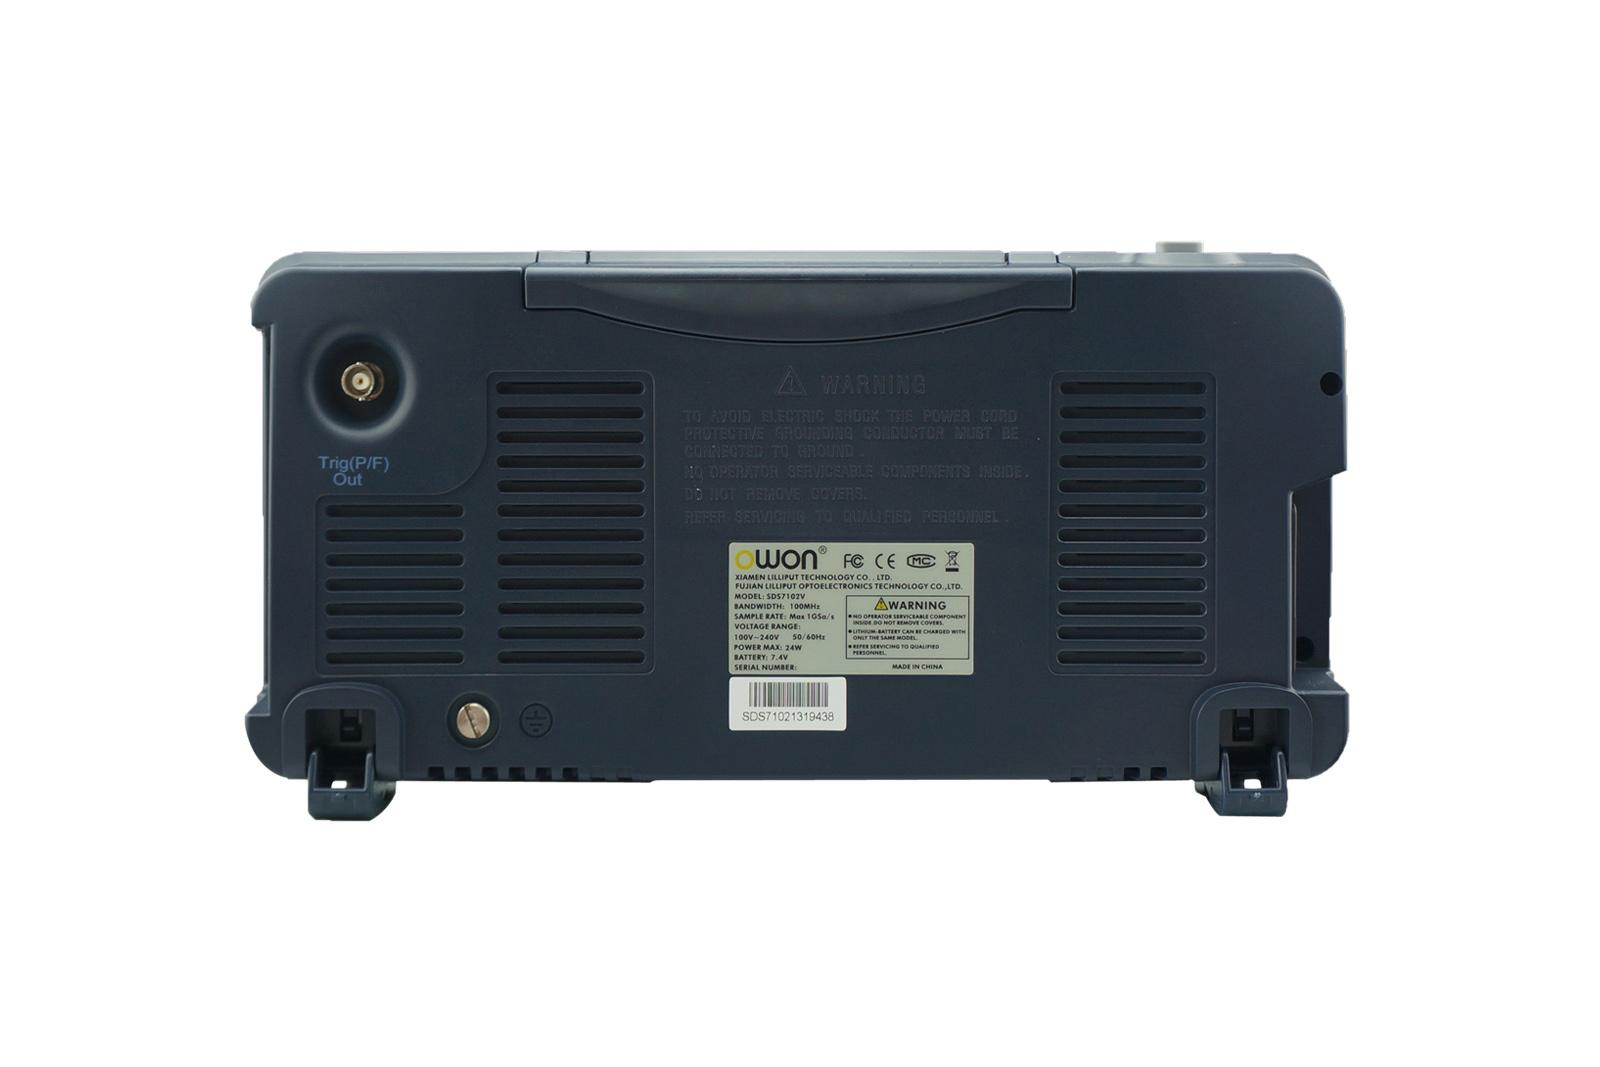 OWON 100MHz 1GS/s Deep Memory Digital Oscilloscope (SDS7102)